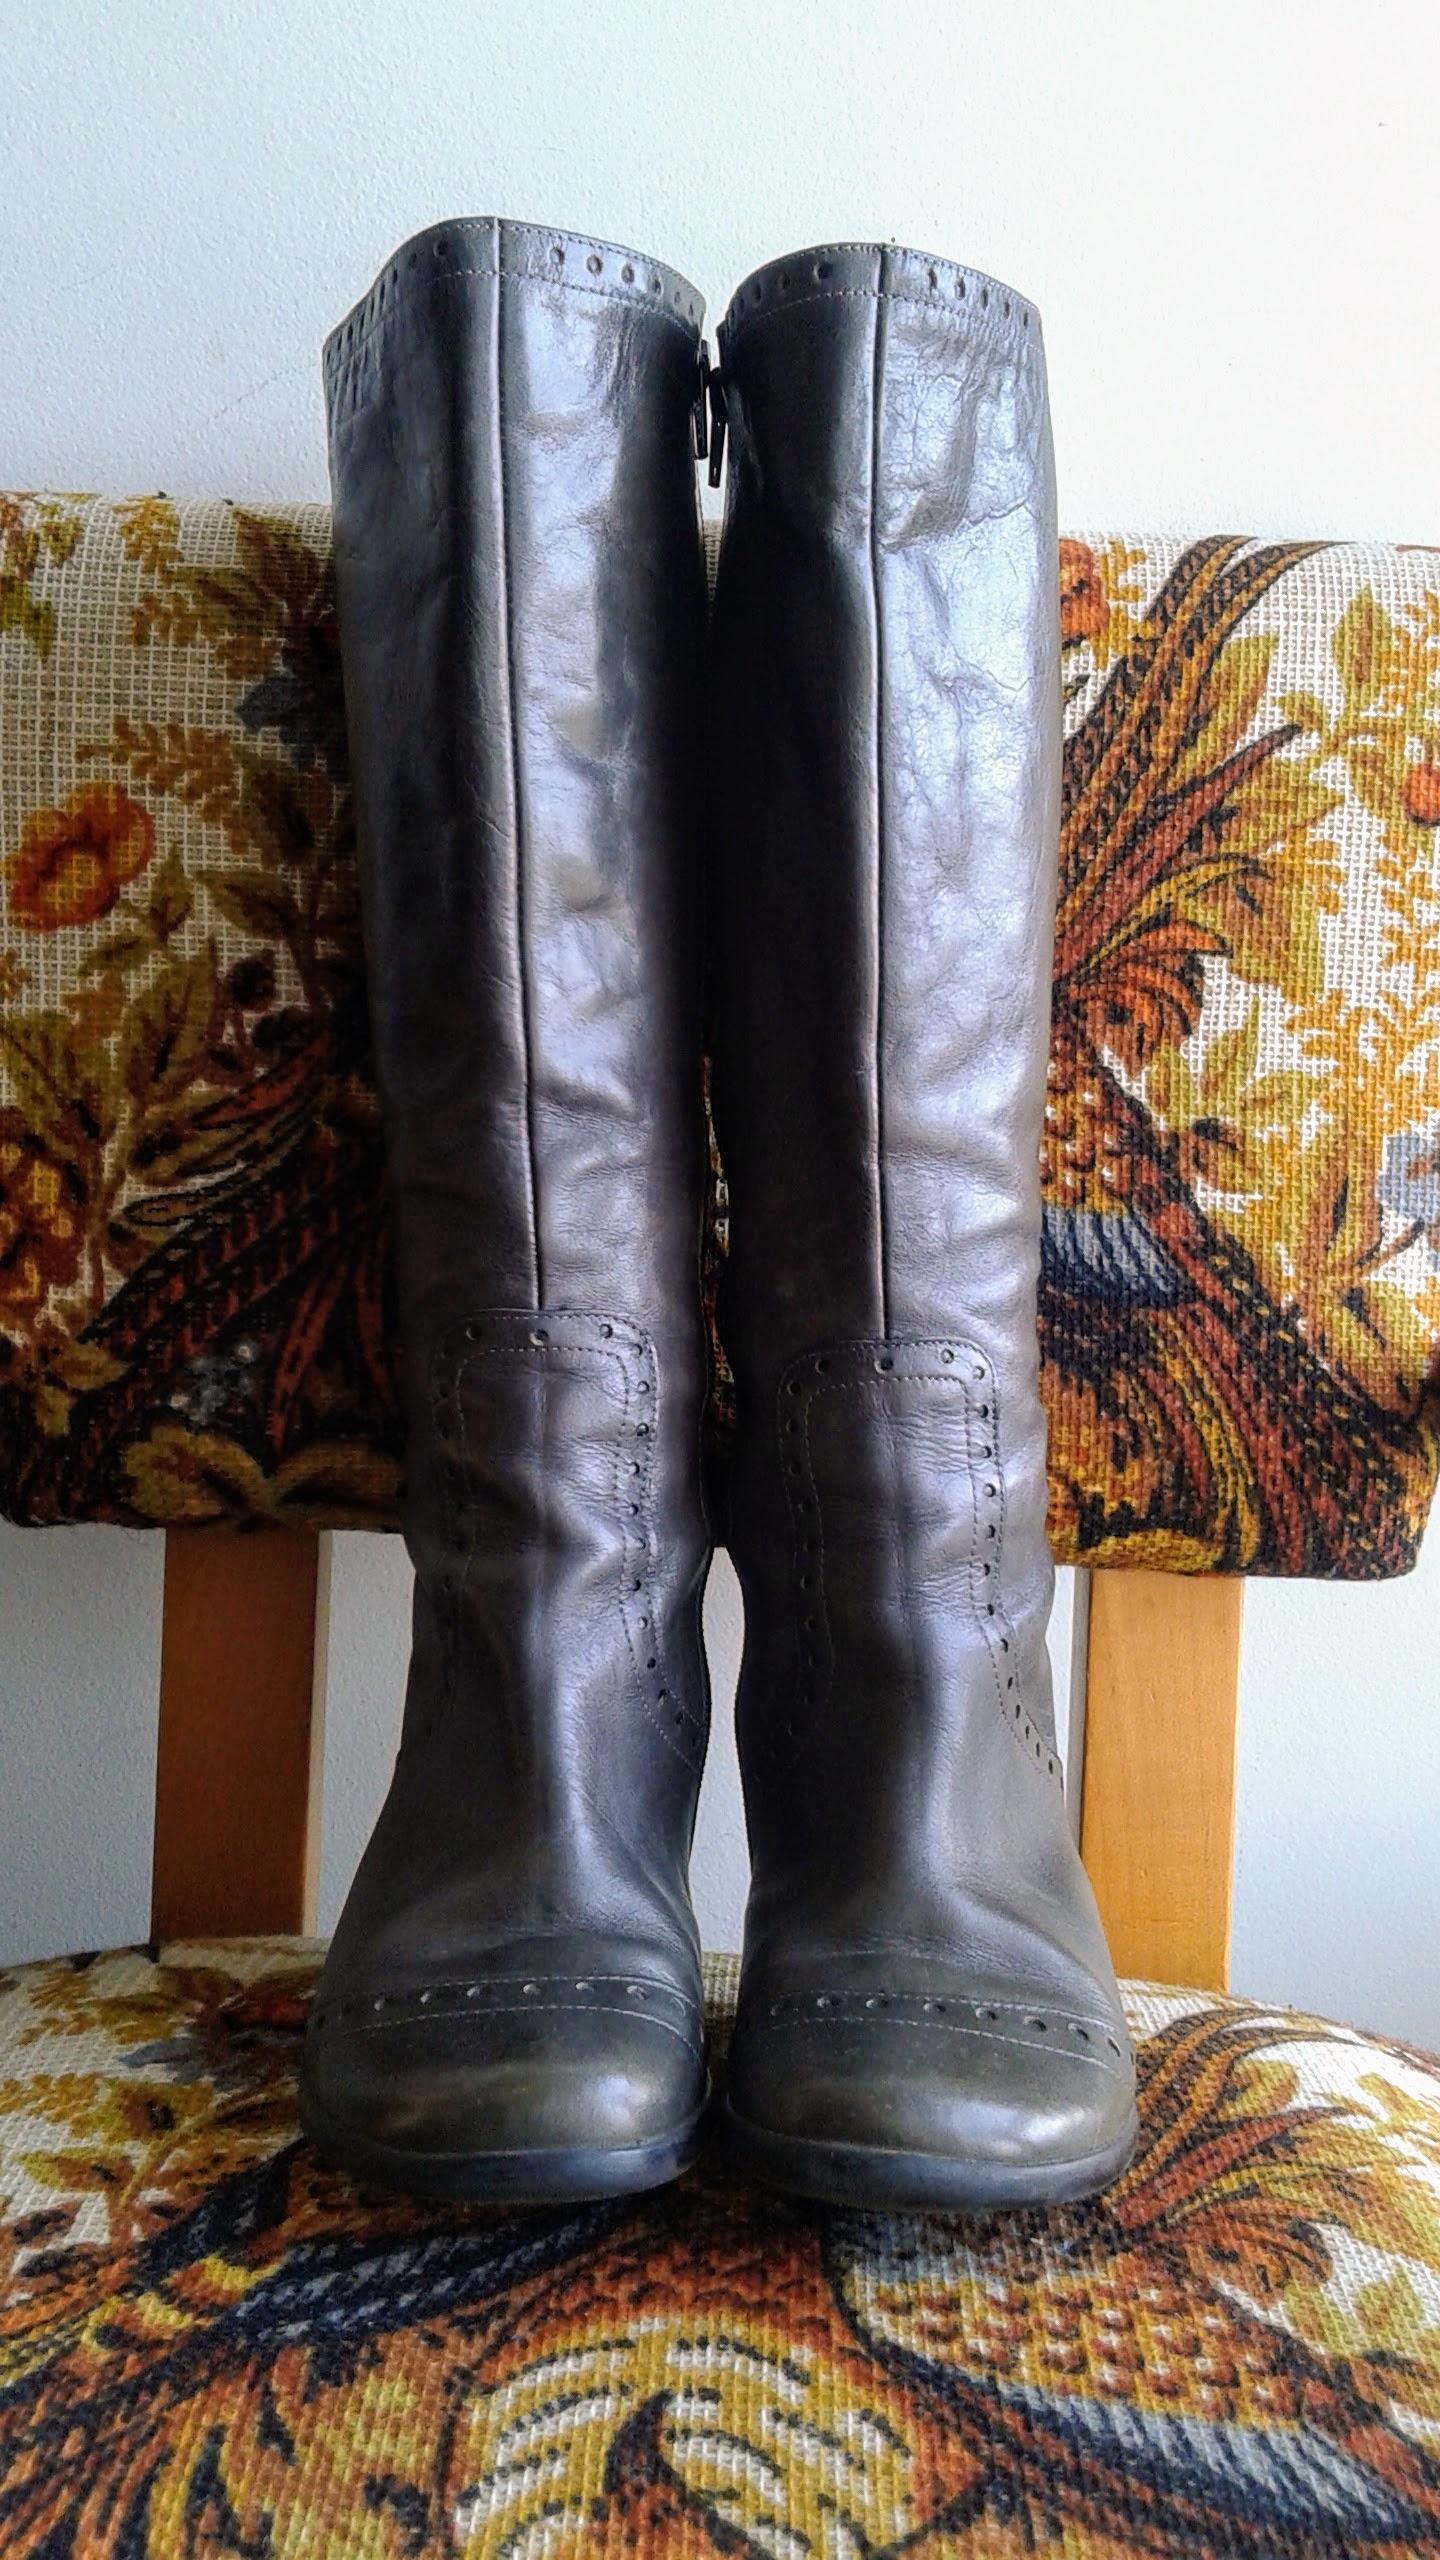 Fluevog boots; S6.5, $48